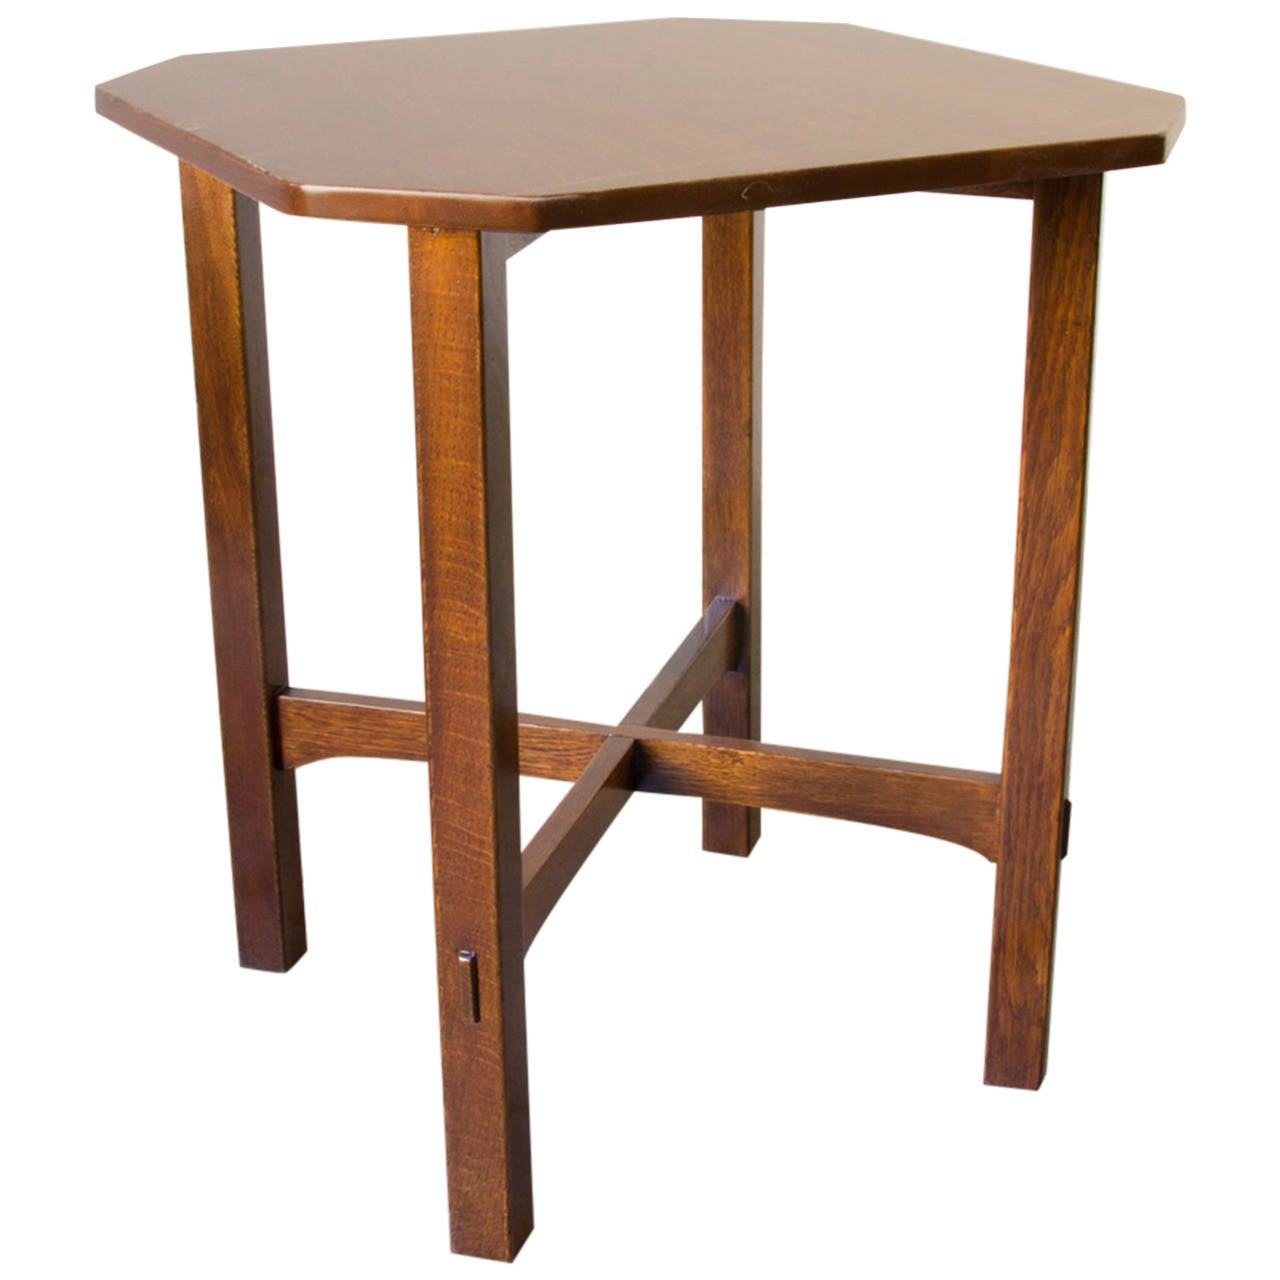 gustav stickley l table at 1stdibs